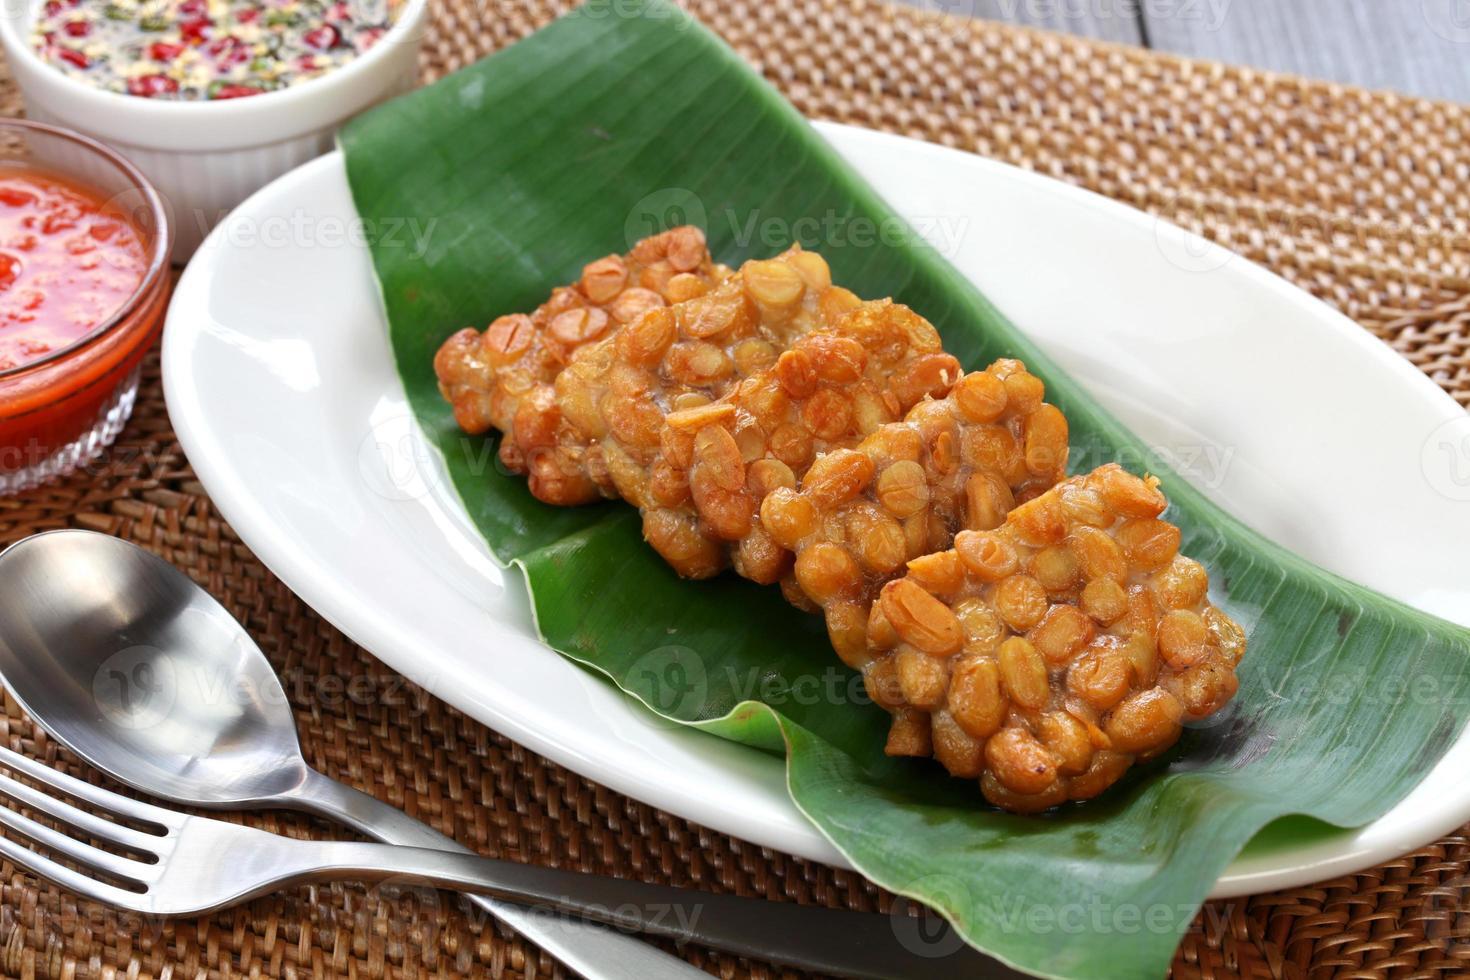 tempe goreng, tempeh frito, comida vegetariana indonesia foto